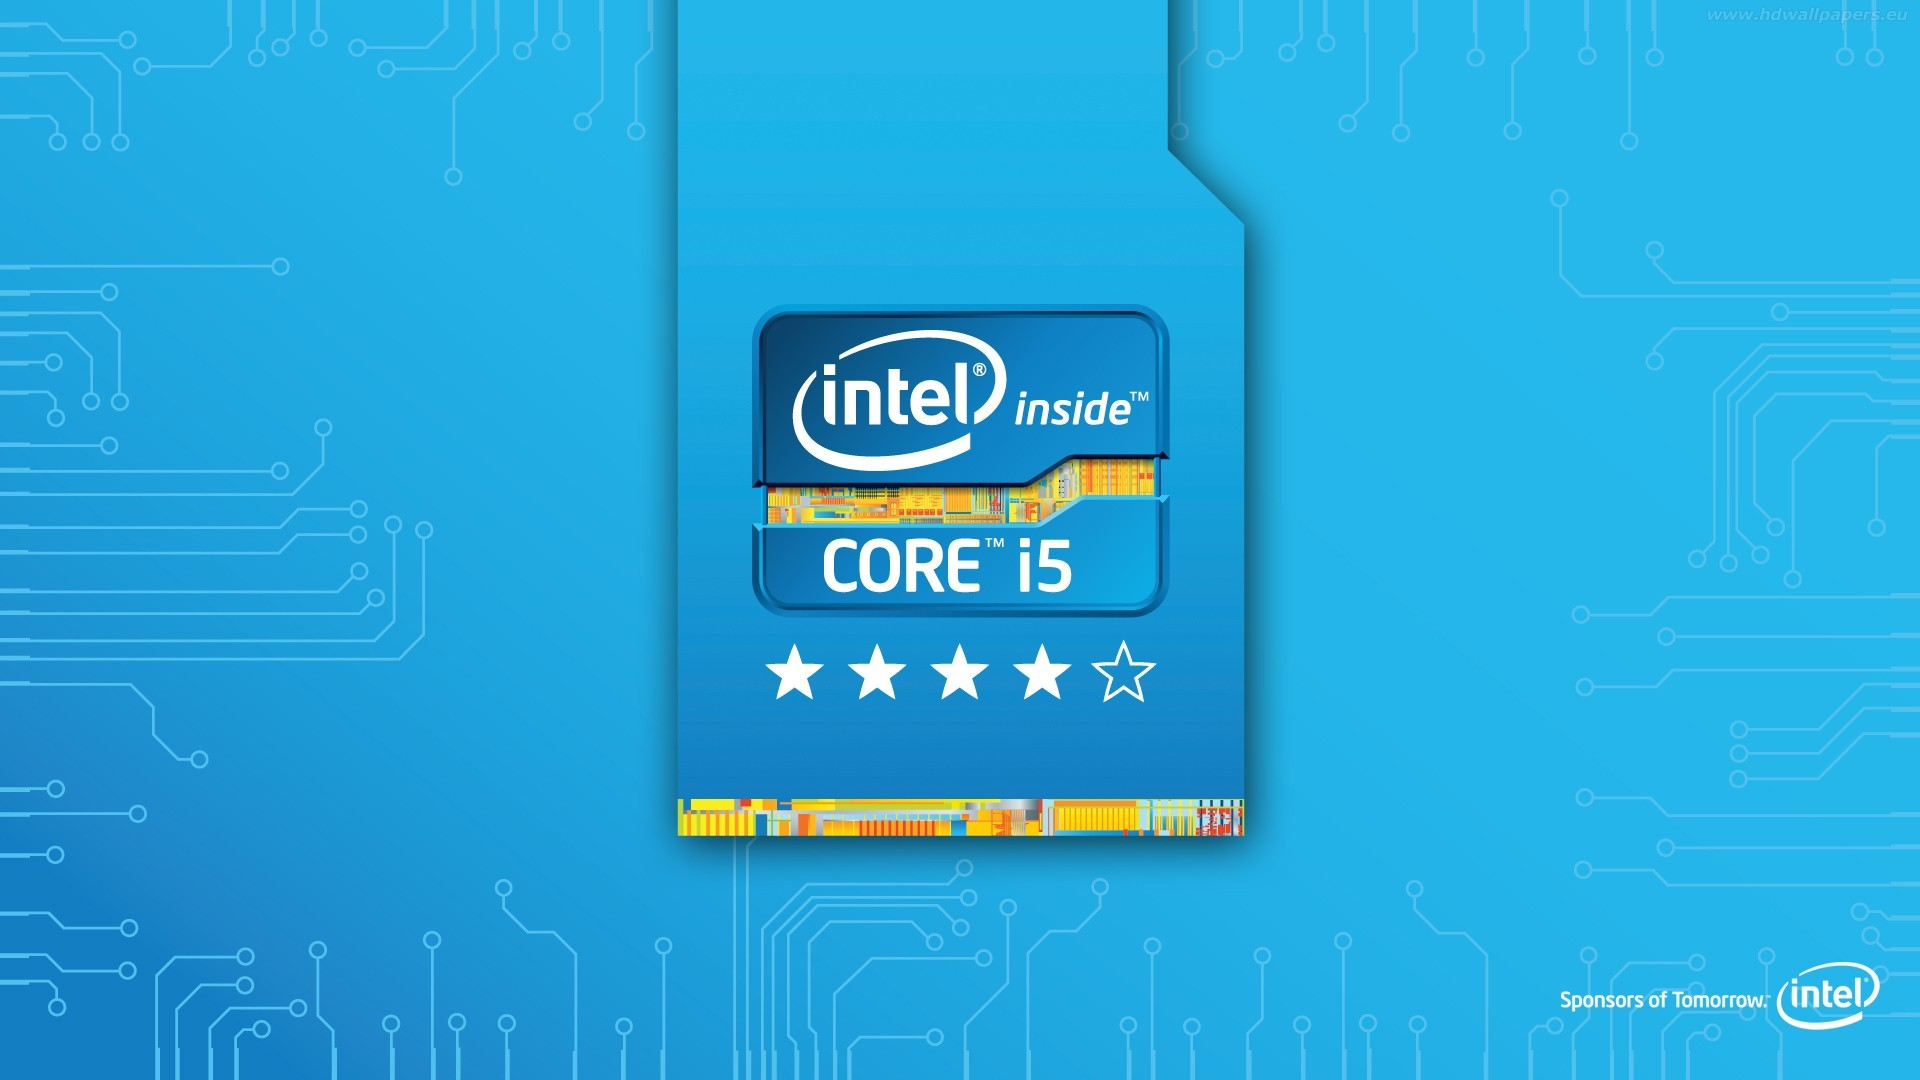 Computers Intel CPU core i5 Intel Core core i3 wallpaper | |  210065 | WallpaperUP